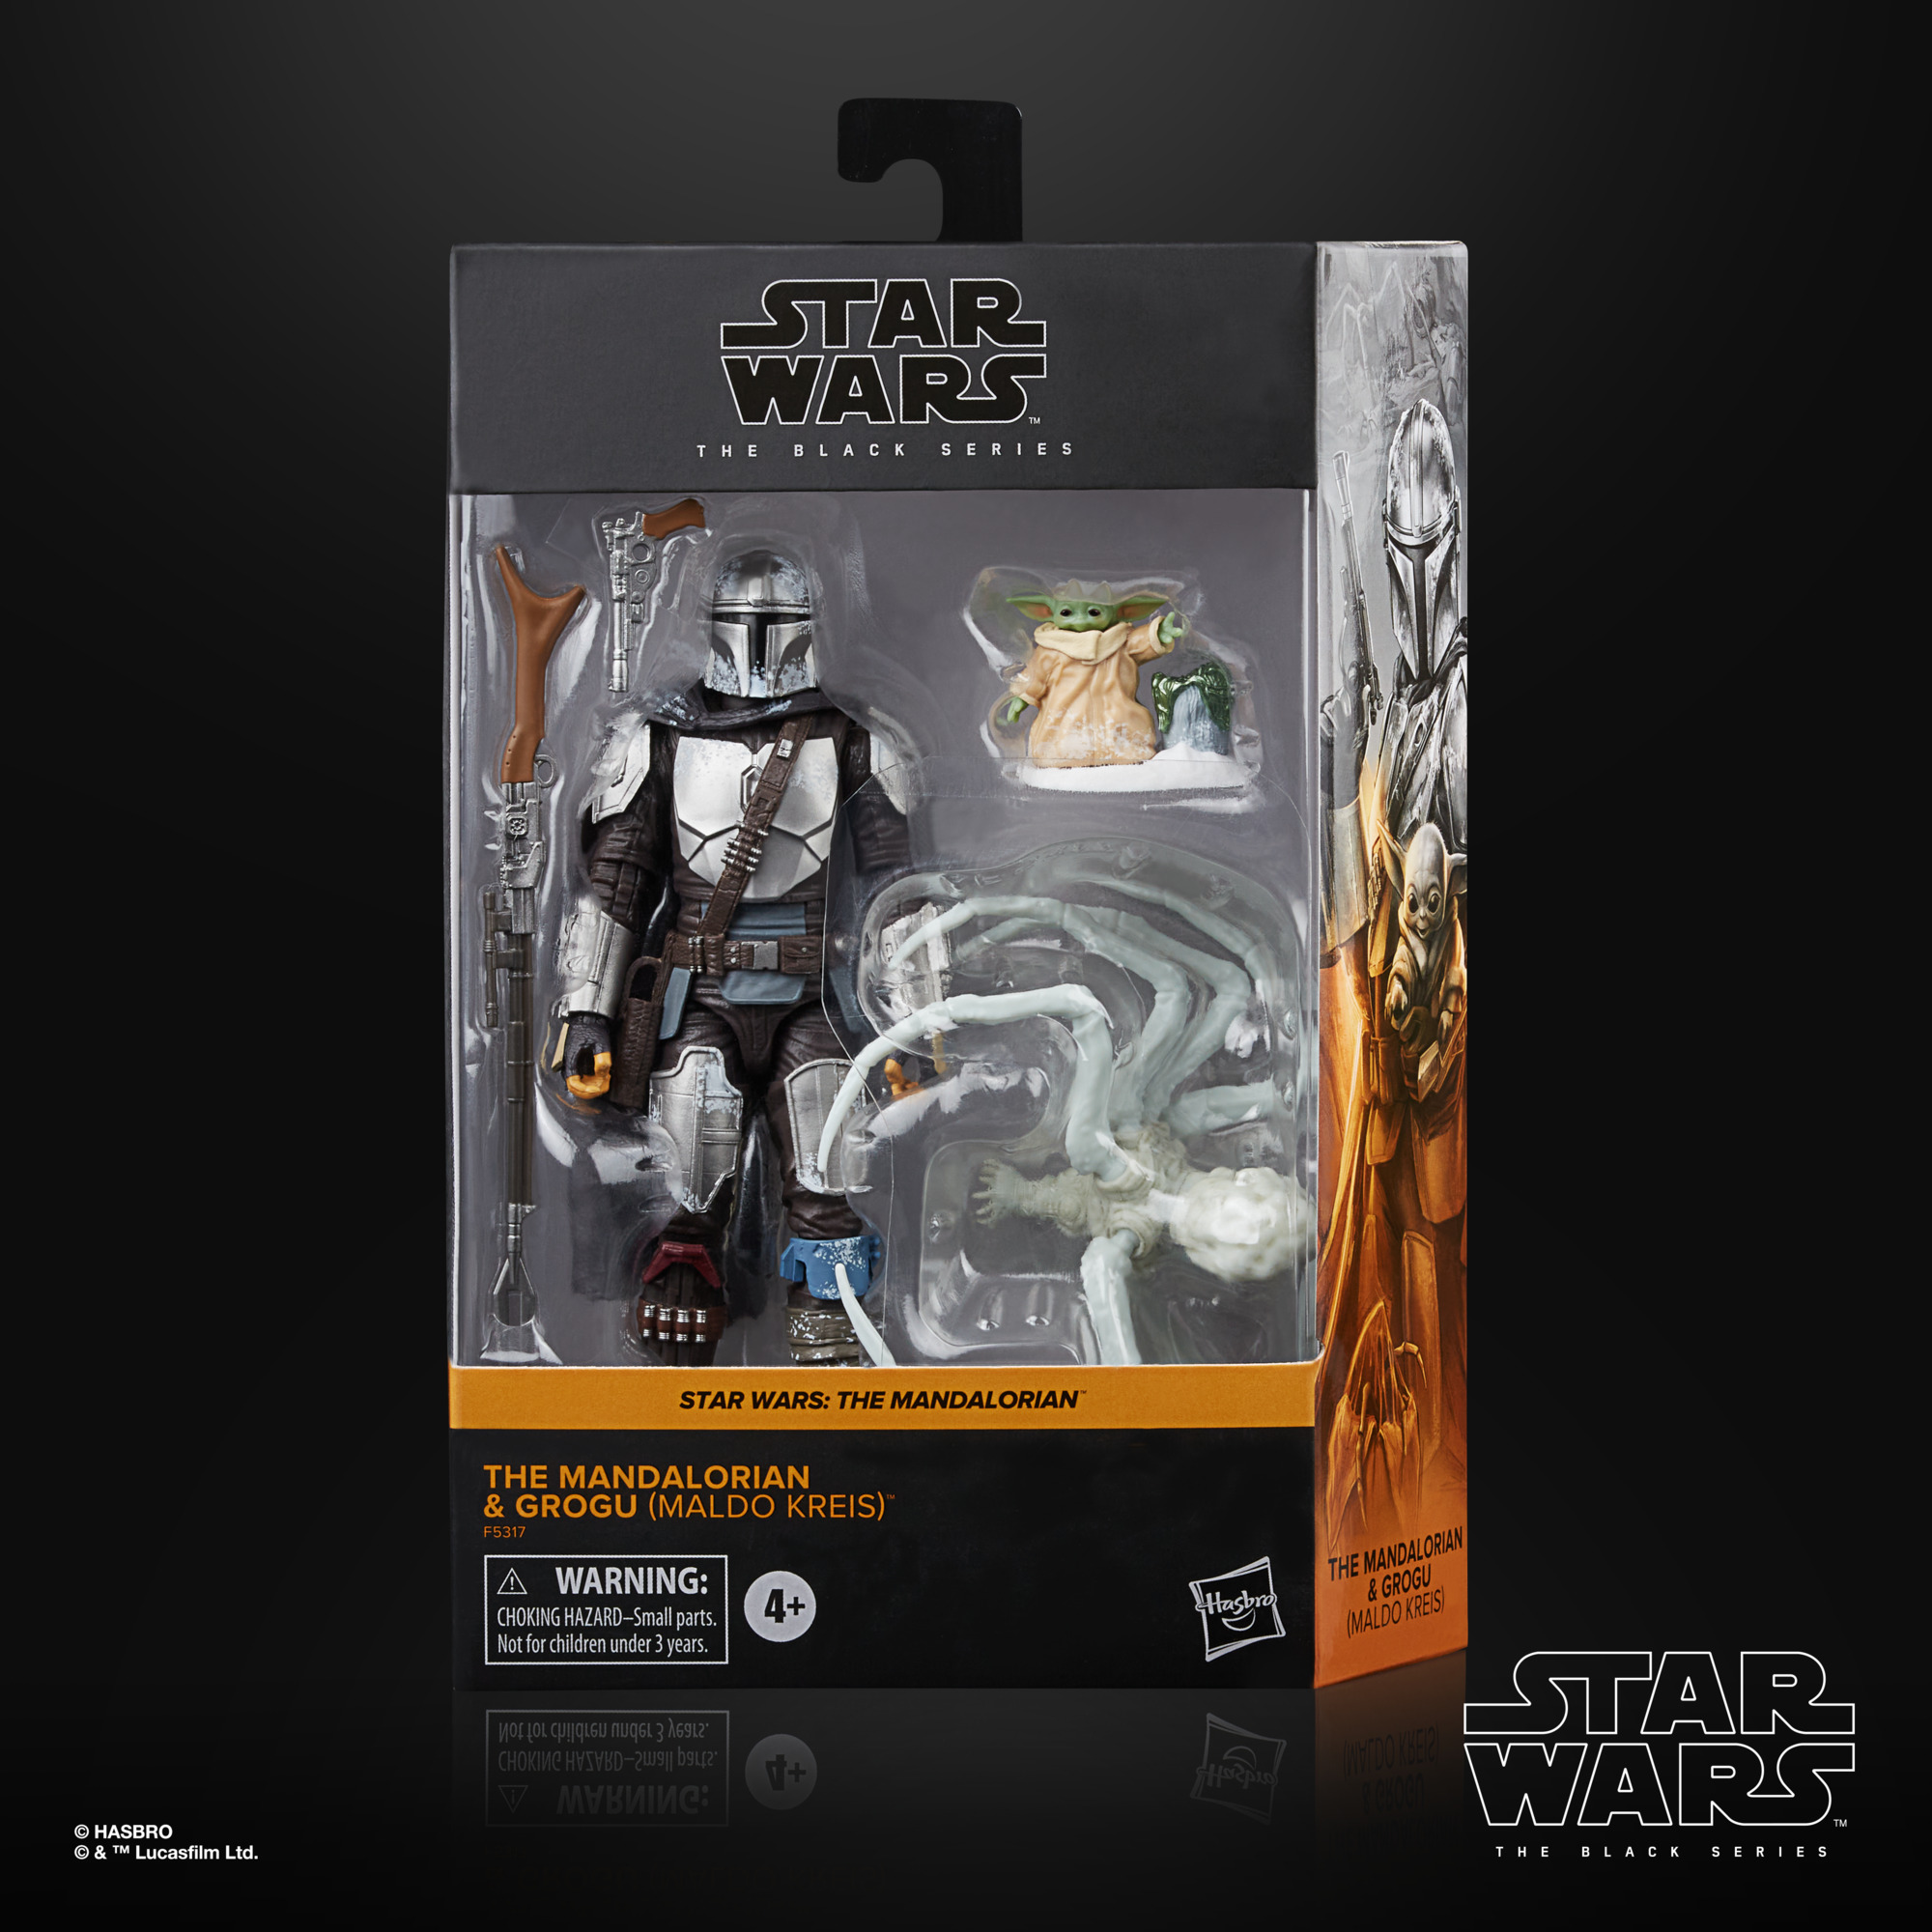 Star Wars The Black Series The Mandalorian & Grogu (Maldo Kreis) F53175L0 5010993954353